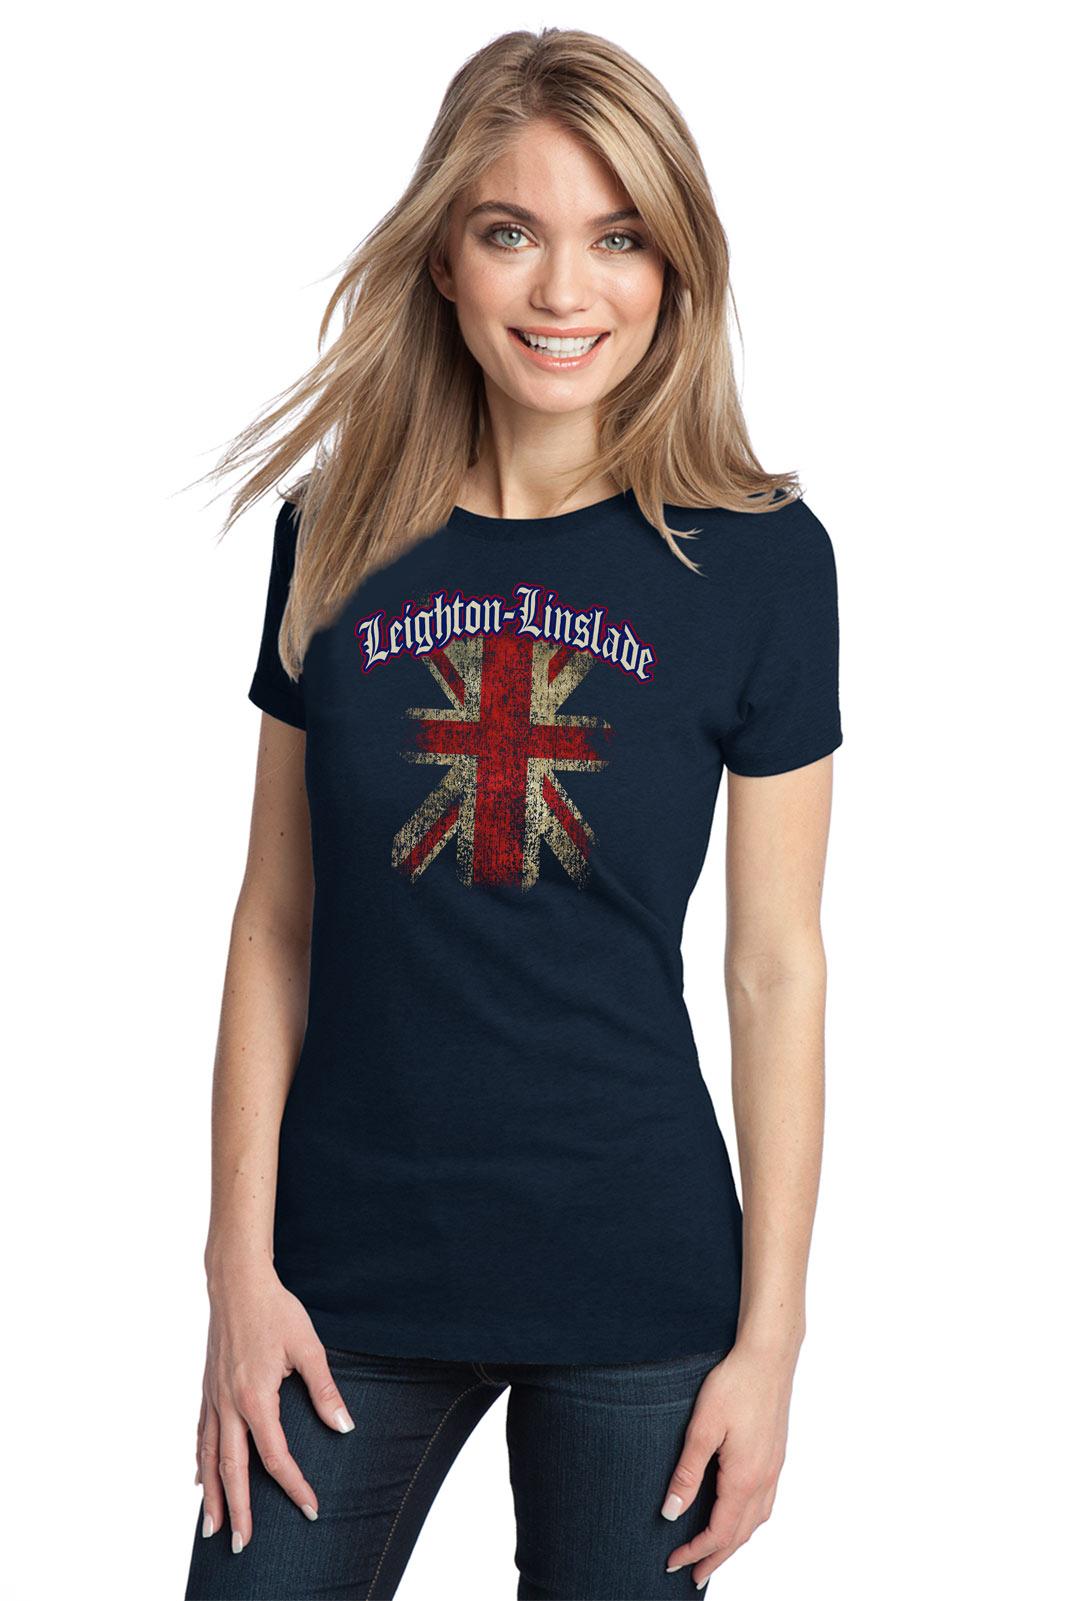 LEIGHTON-LINSLADE-ENGLAND-Adult-Ladies-T-shirt-United-Kingdom-UK-English-Un